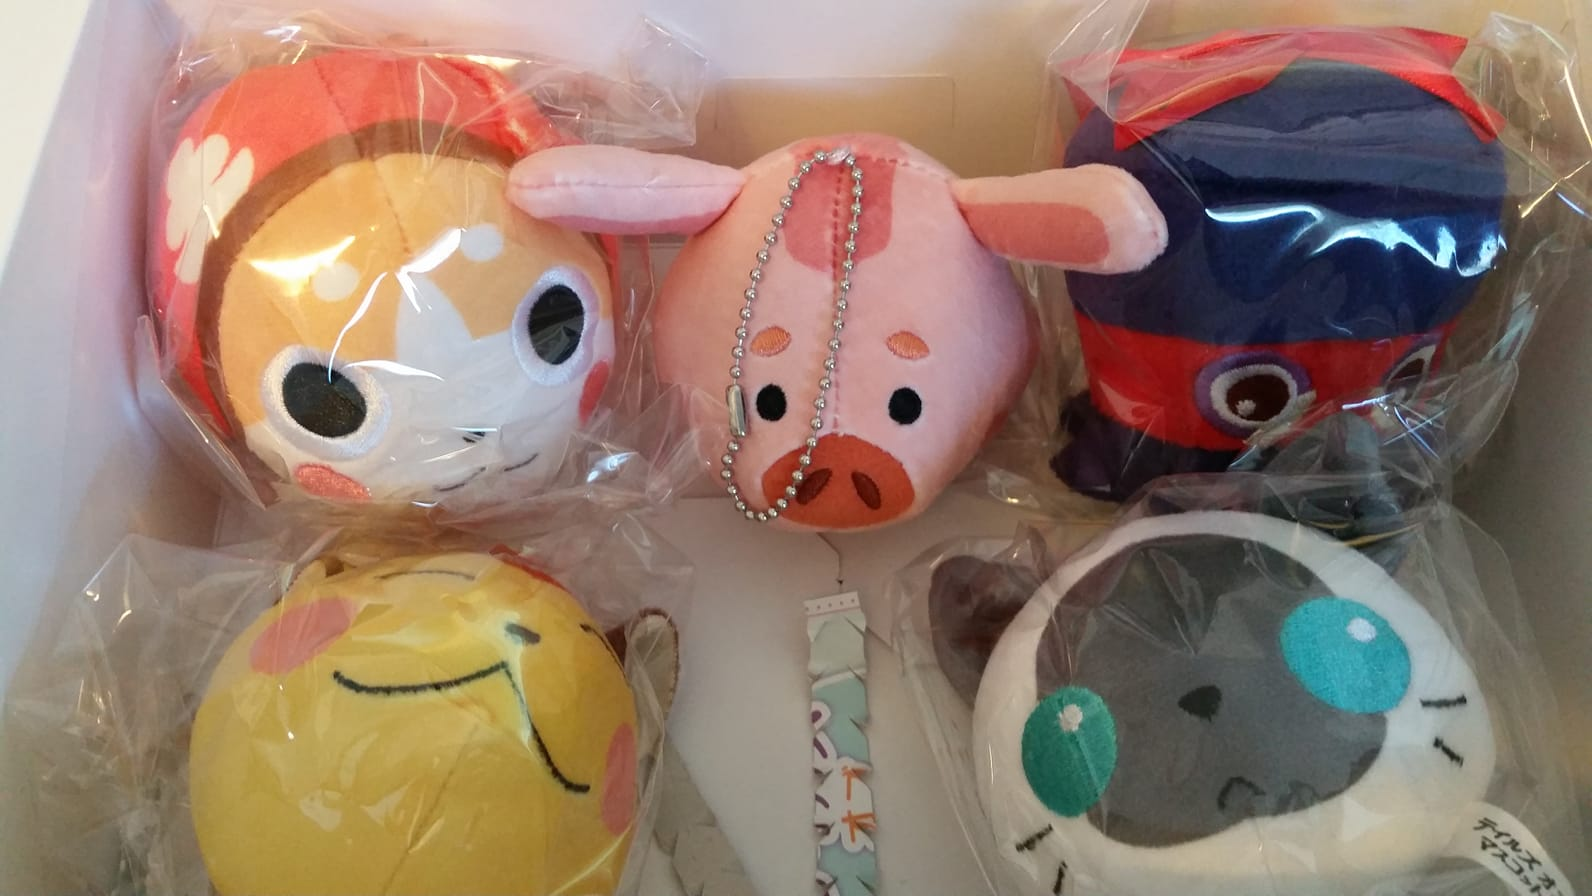 Tales of Mascot plushies